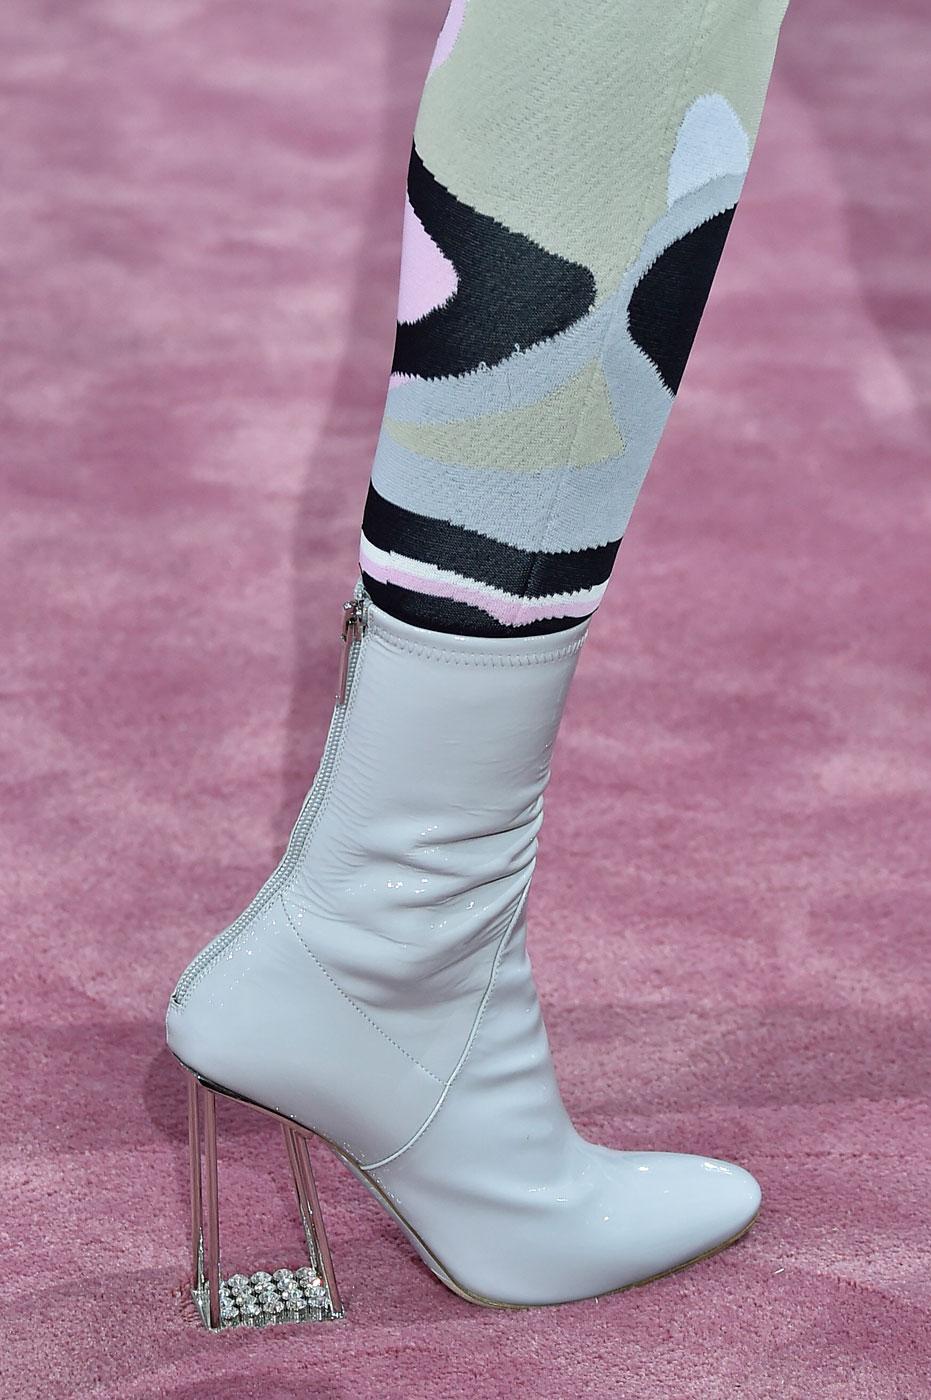 Christian-Dior-fashion-runway-show-close-ups-haute-couture-paris-spring-summer-2015-the-impression-050